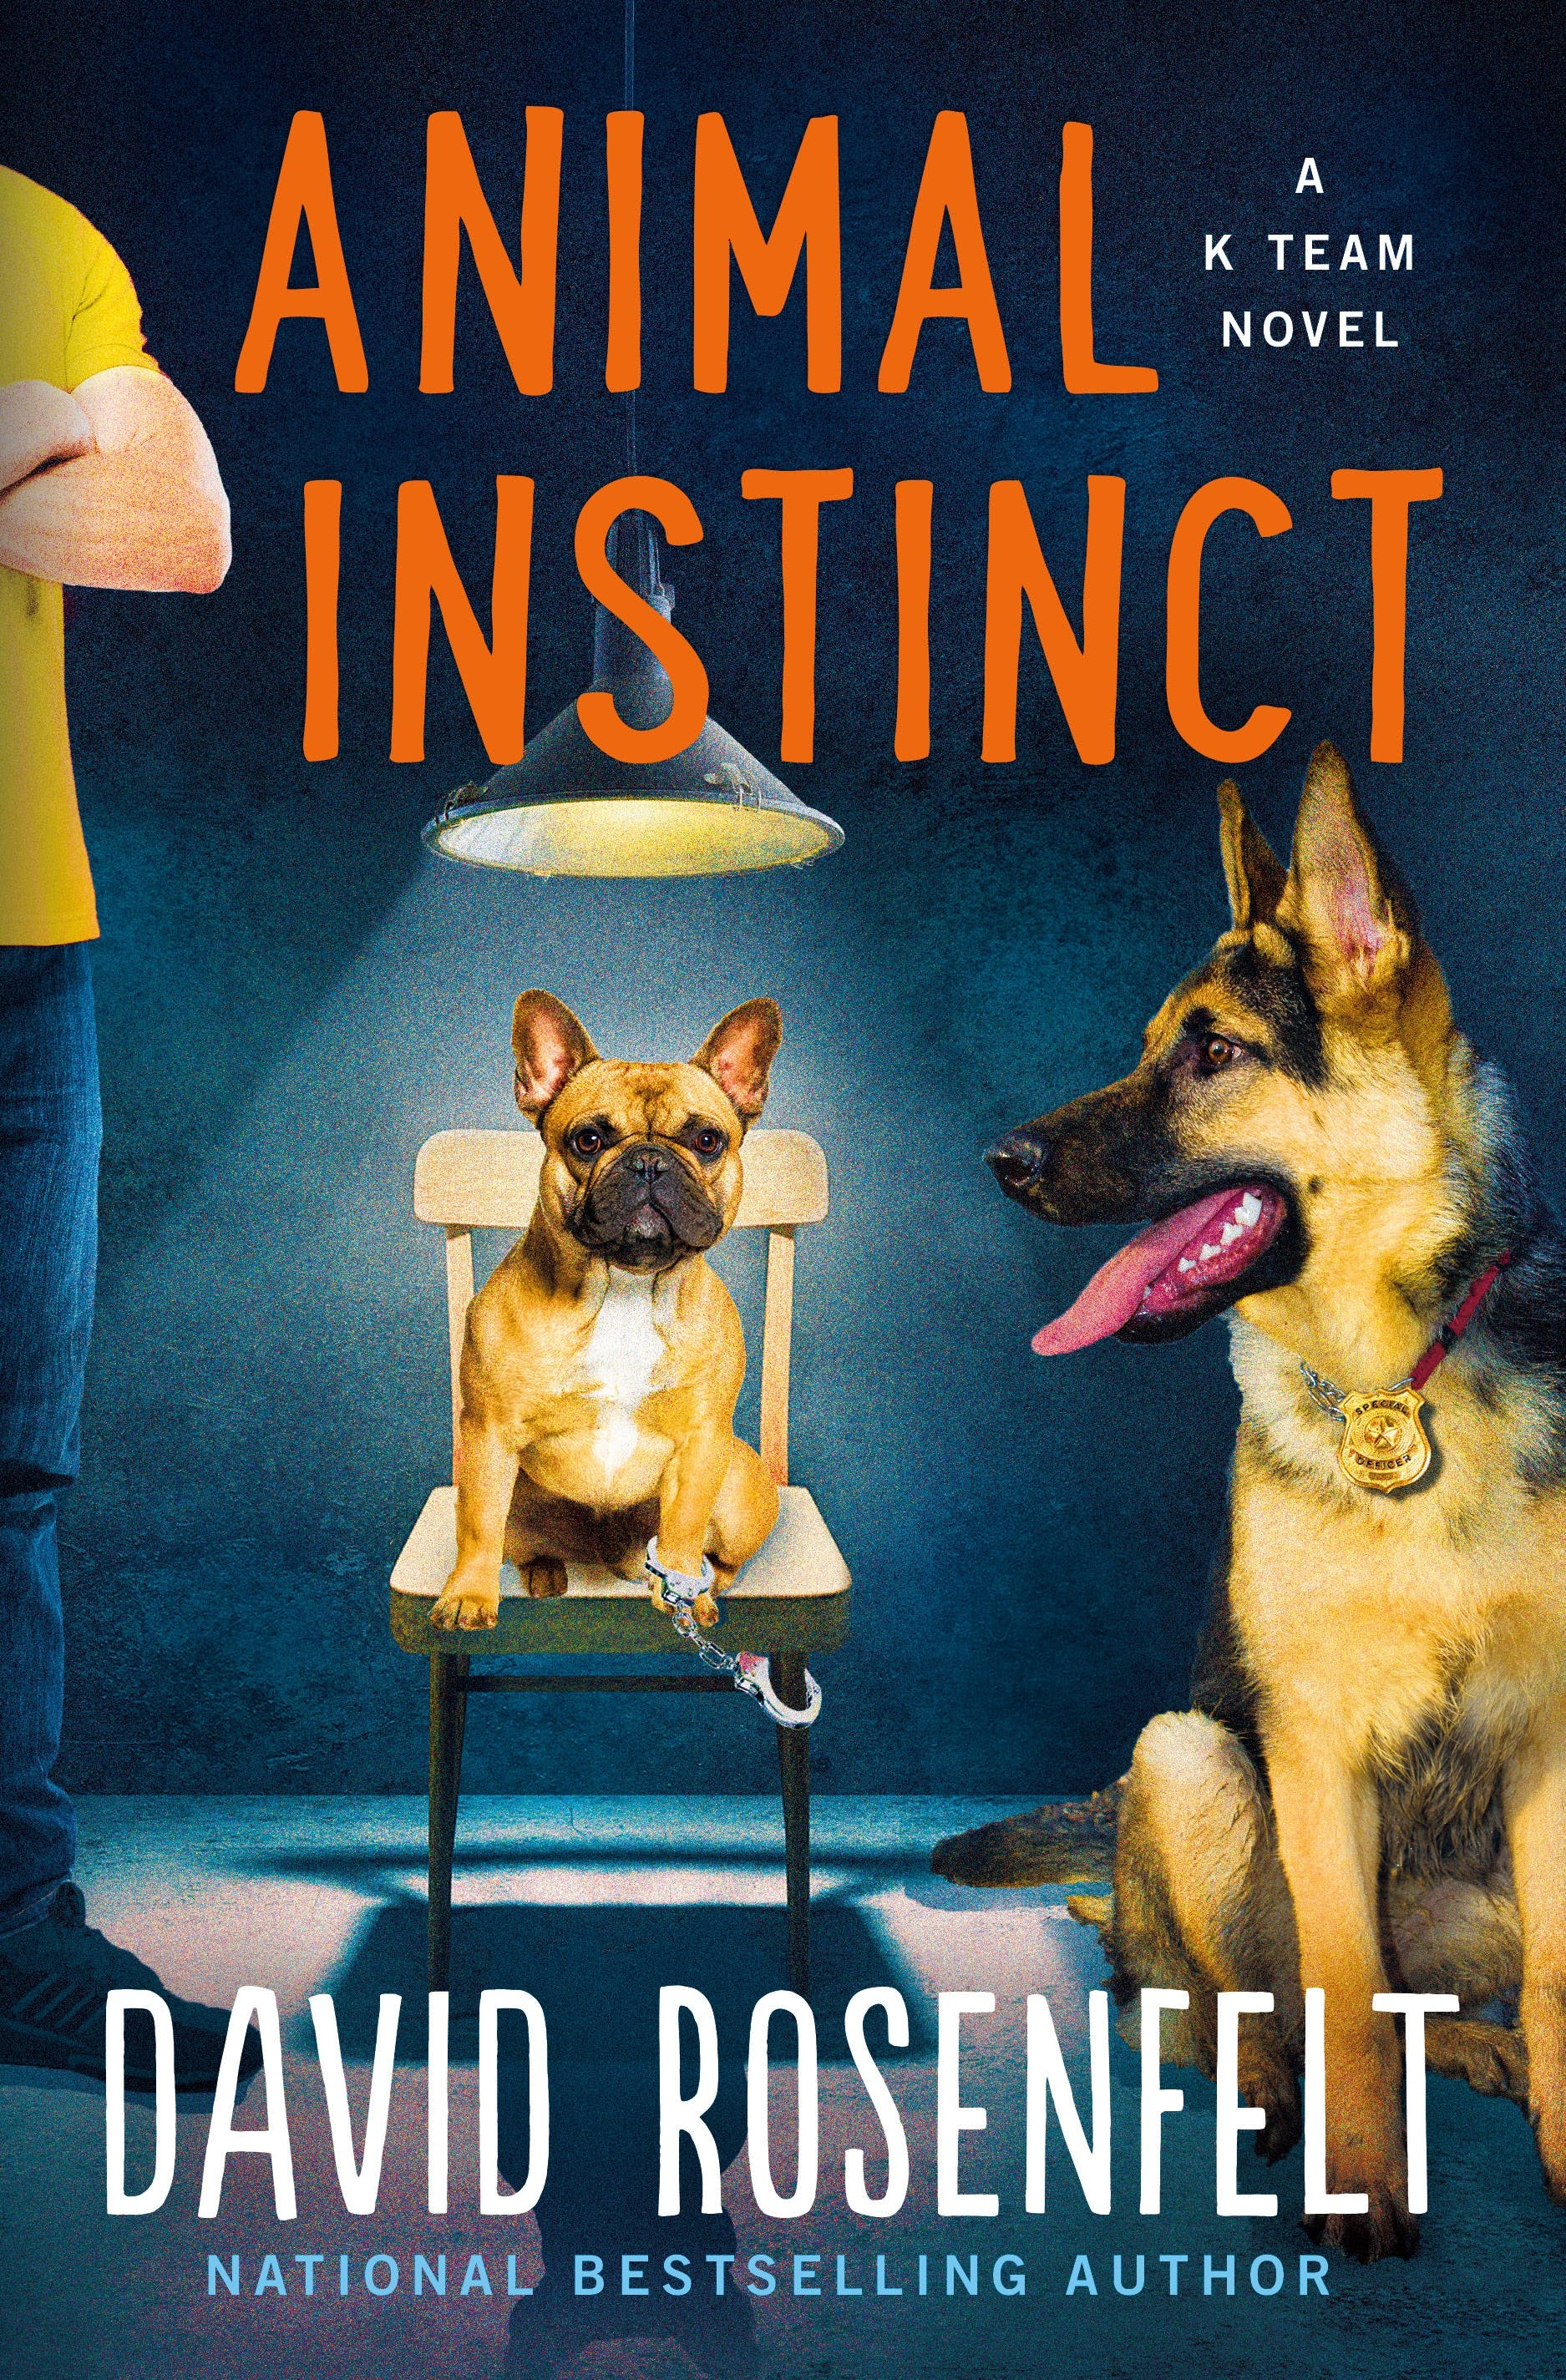 Image of Animal Instinct